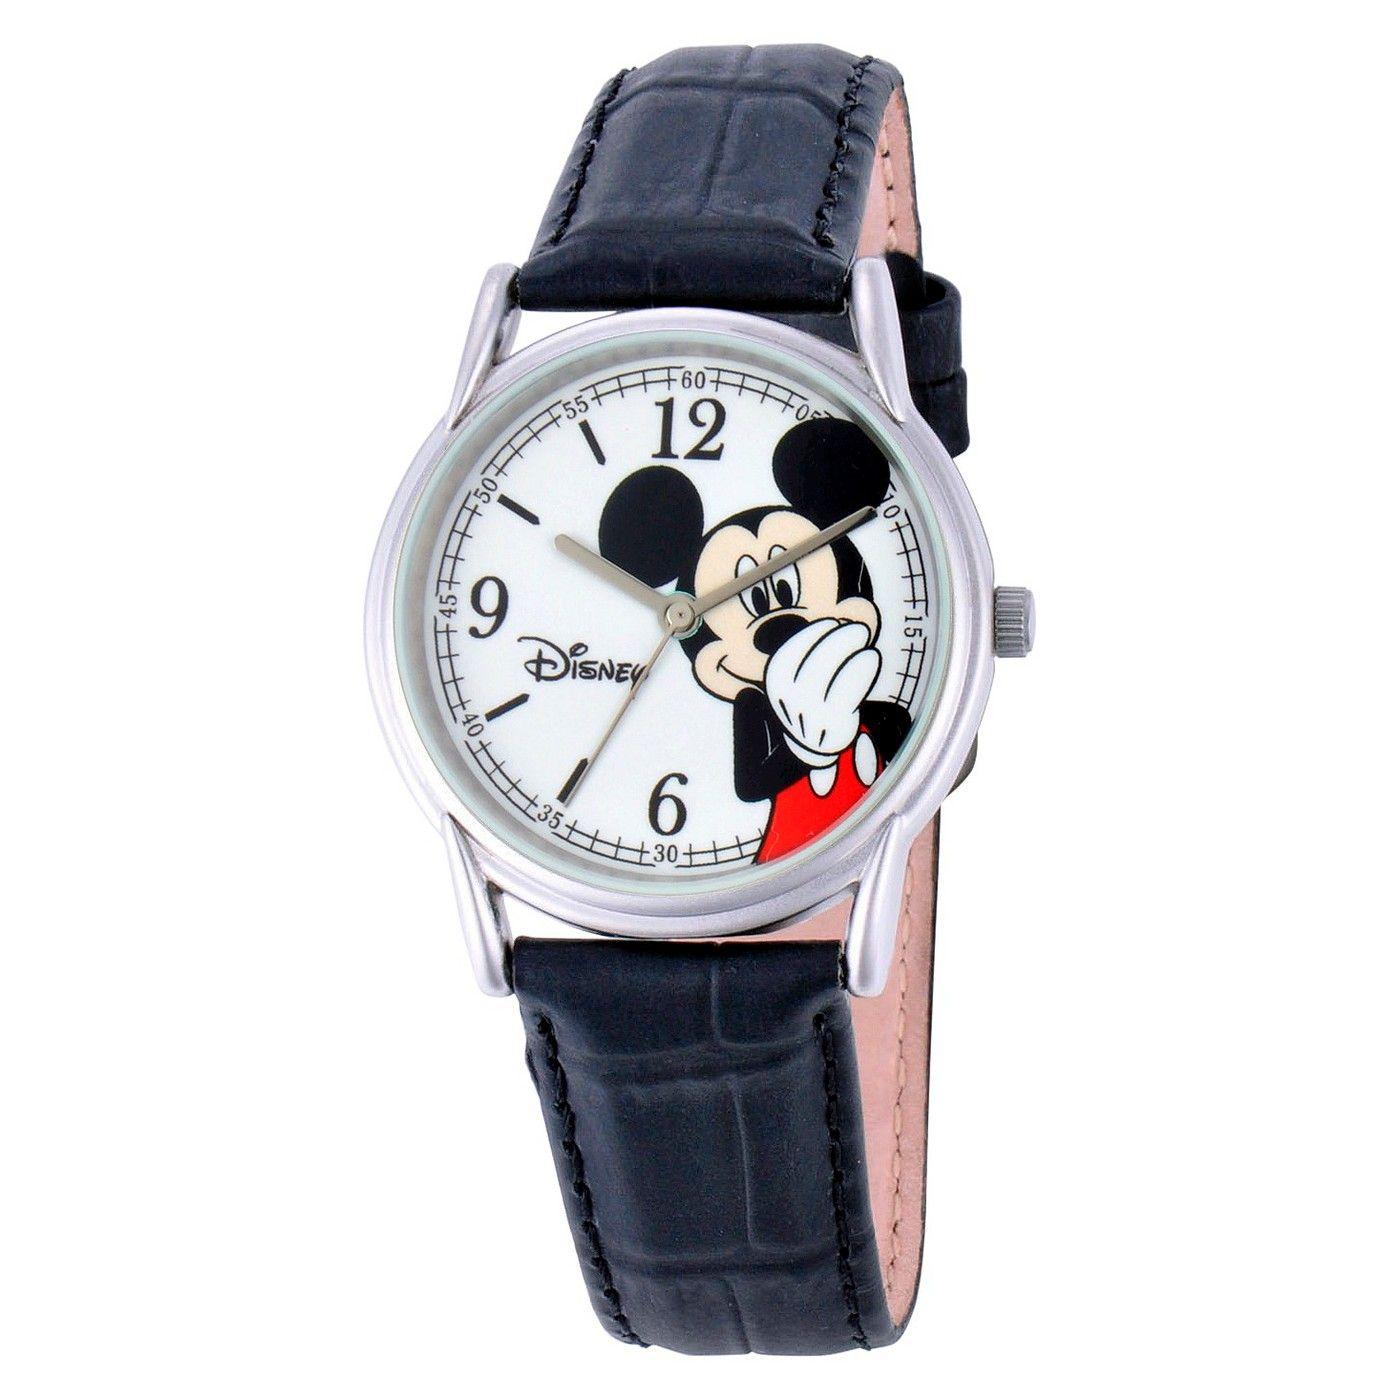 bdbd20229390 Men s Disney® Mickey Mouse Cardiff Watch - Black  Mickey